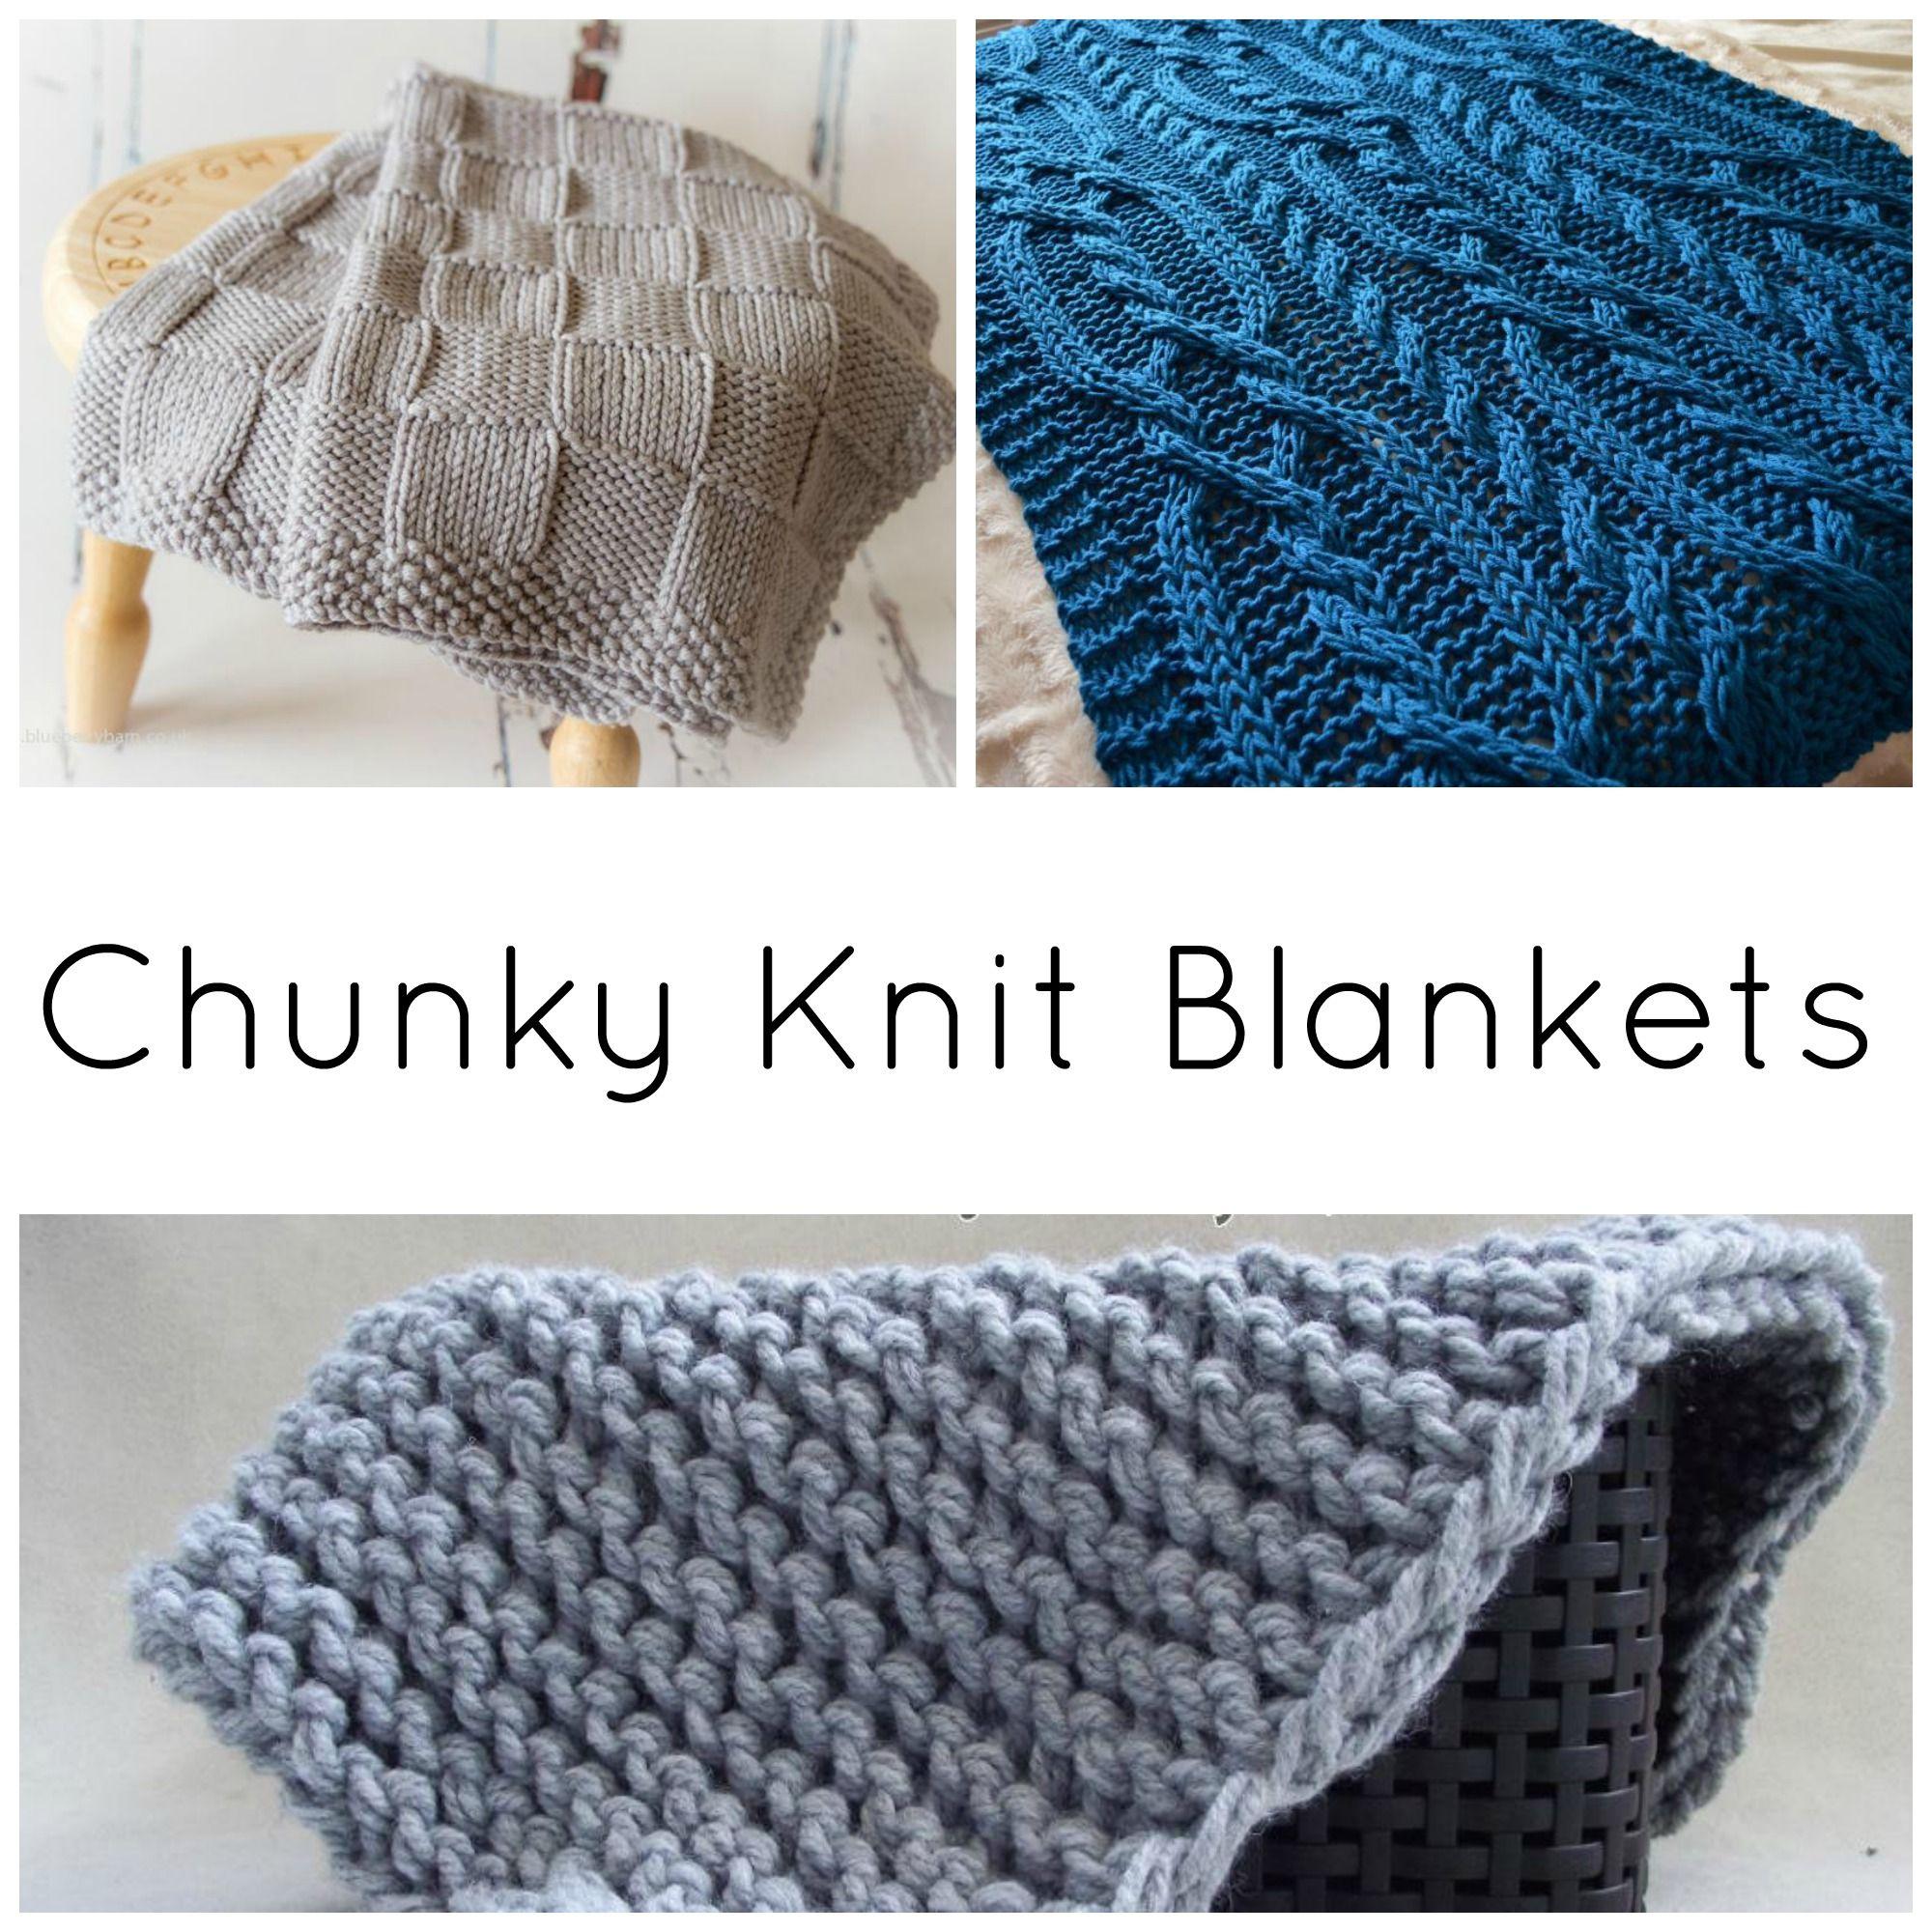 10 Quick & Cozy Chunky Knit Blanket Patterns on Craftsy | Manta ...